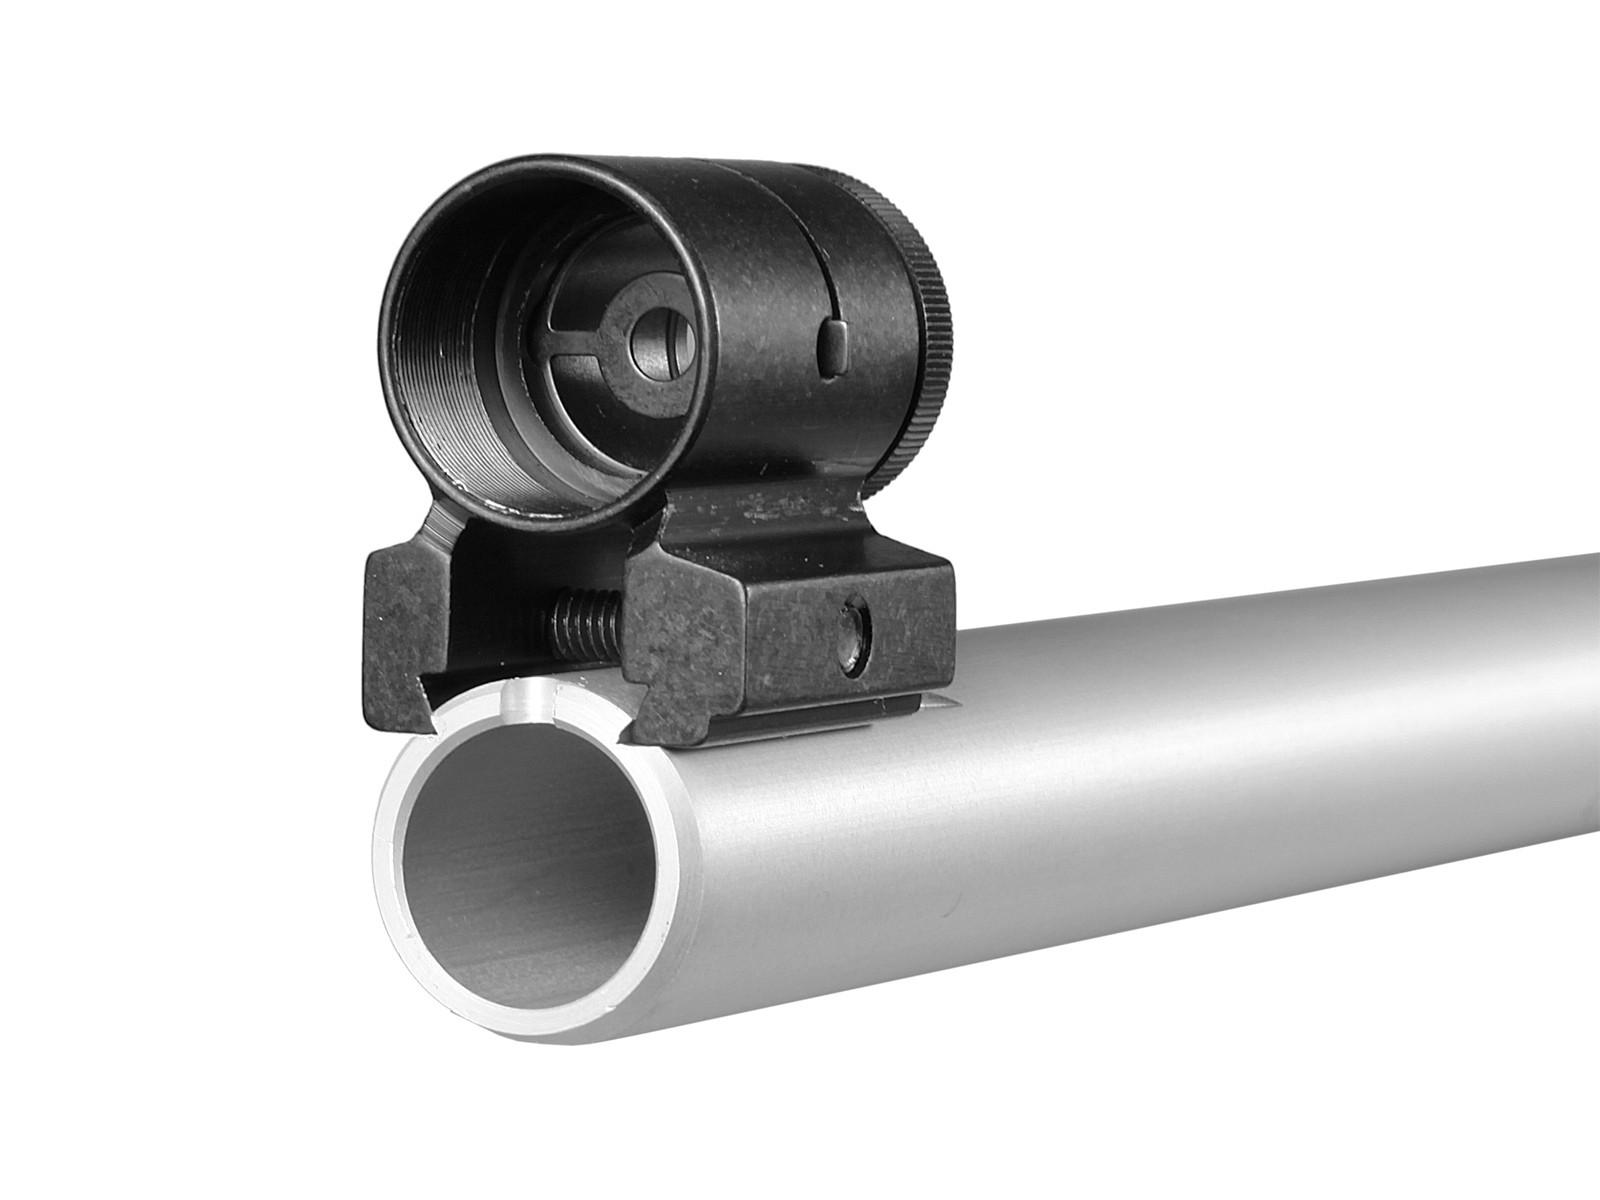 feinwerkbau 500 10 meter air rifle ambi stock pcp cal ebay. Black Bedroom Furniture Sets. Home Design Ideas